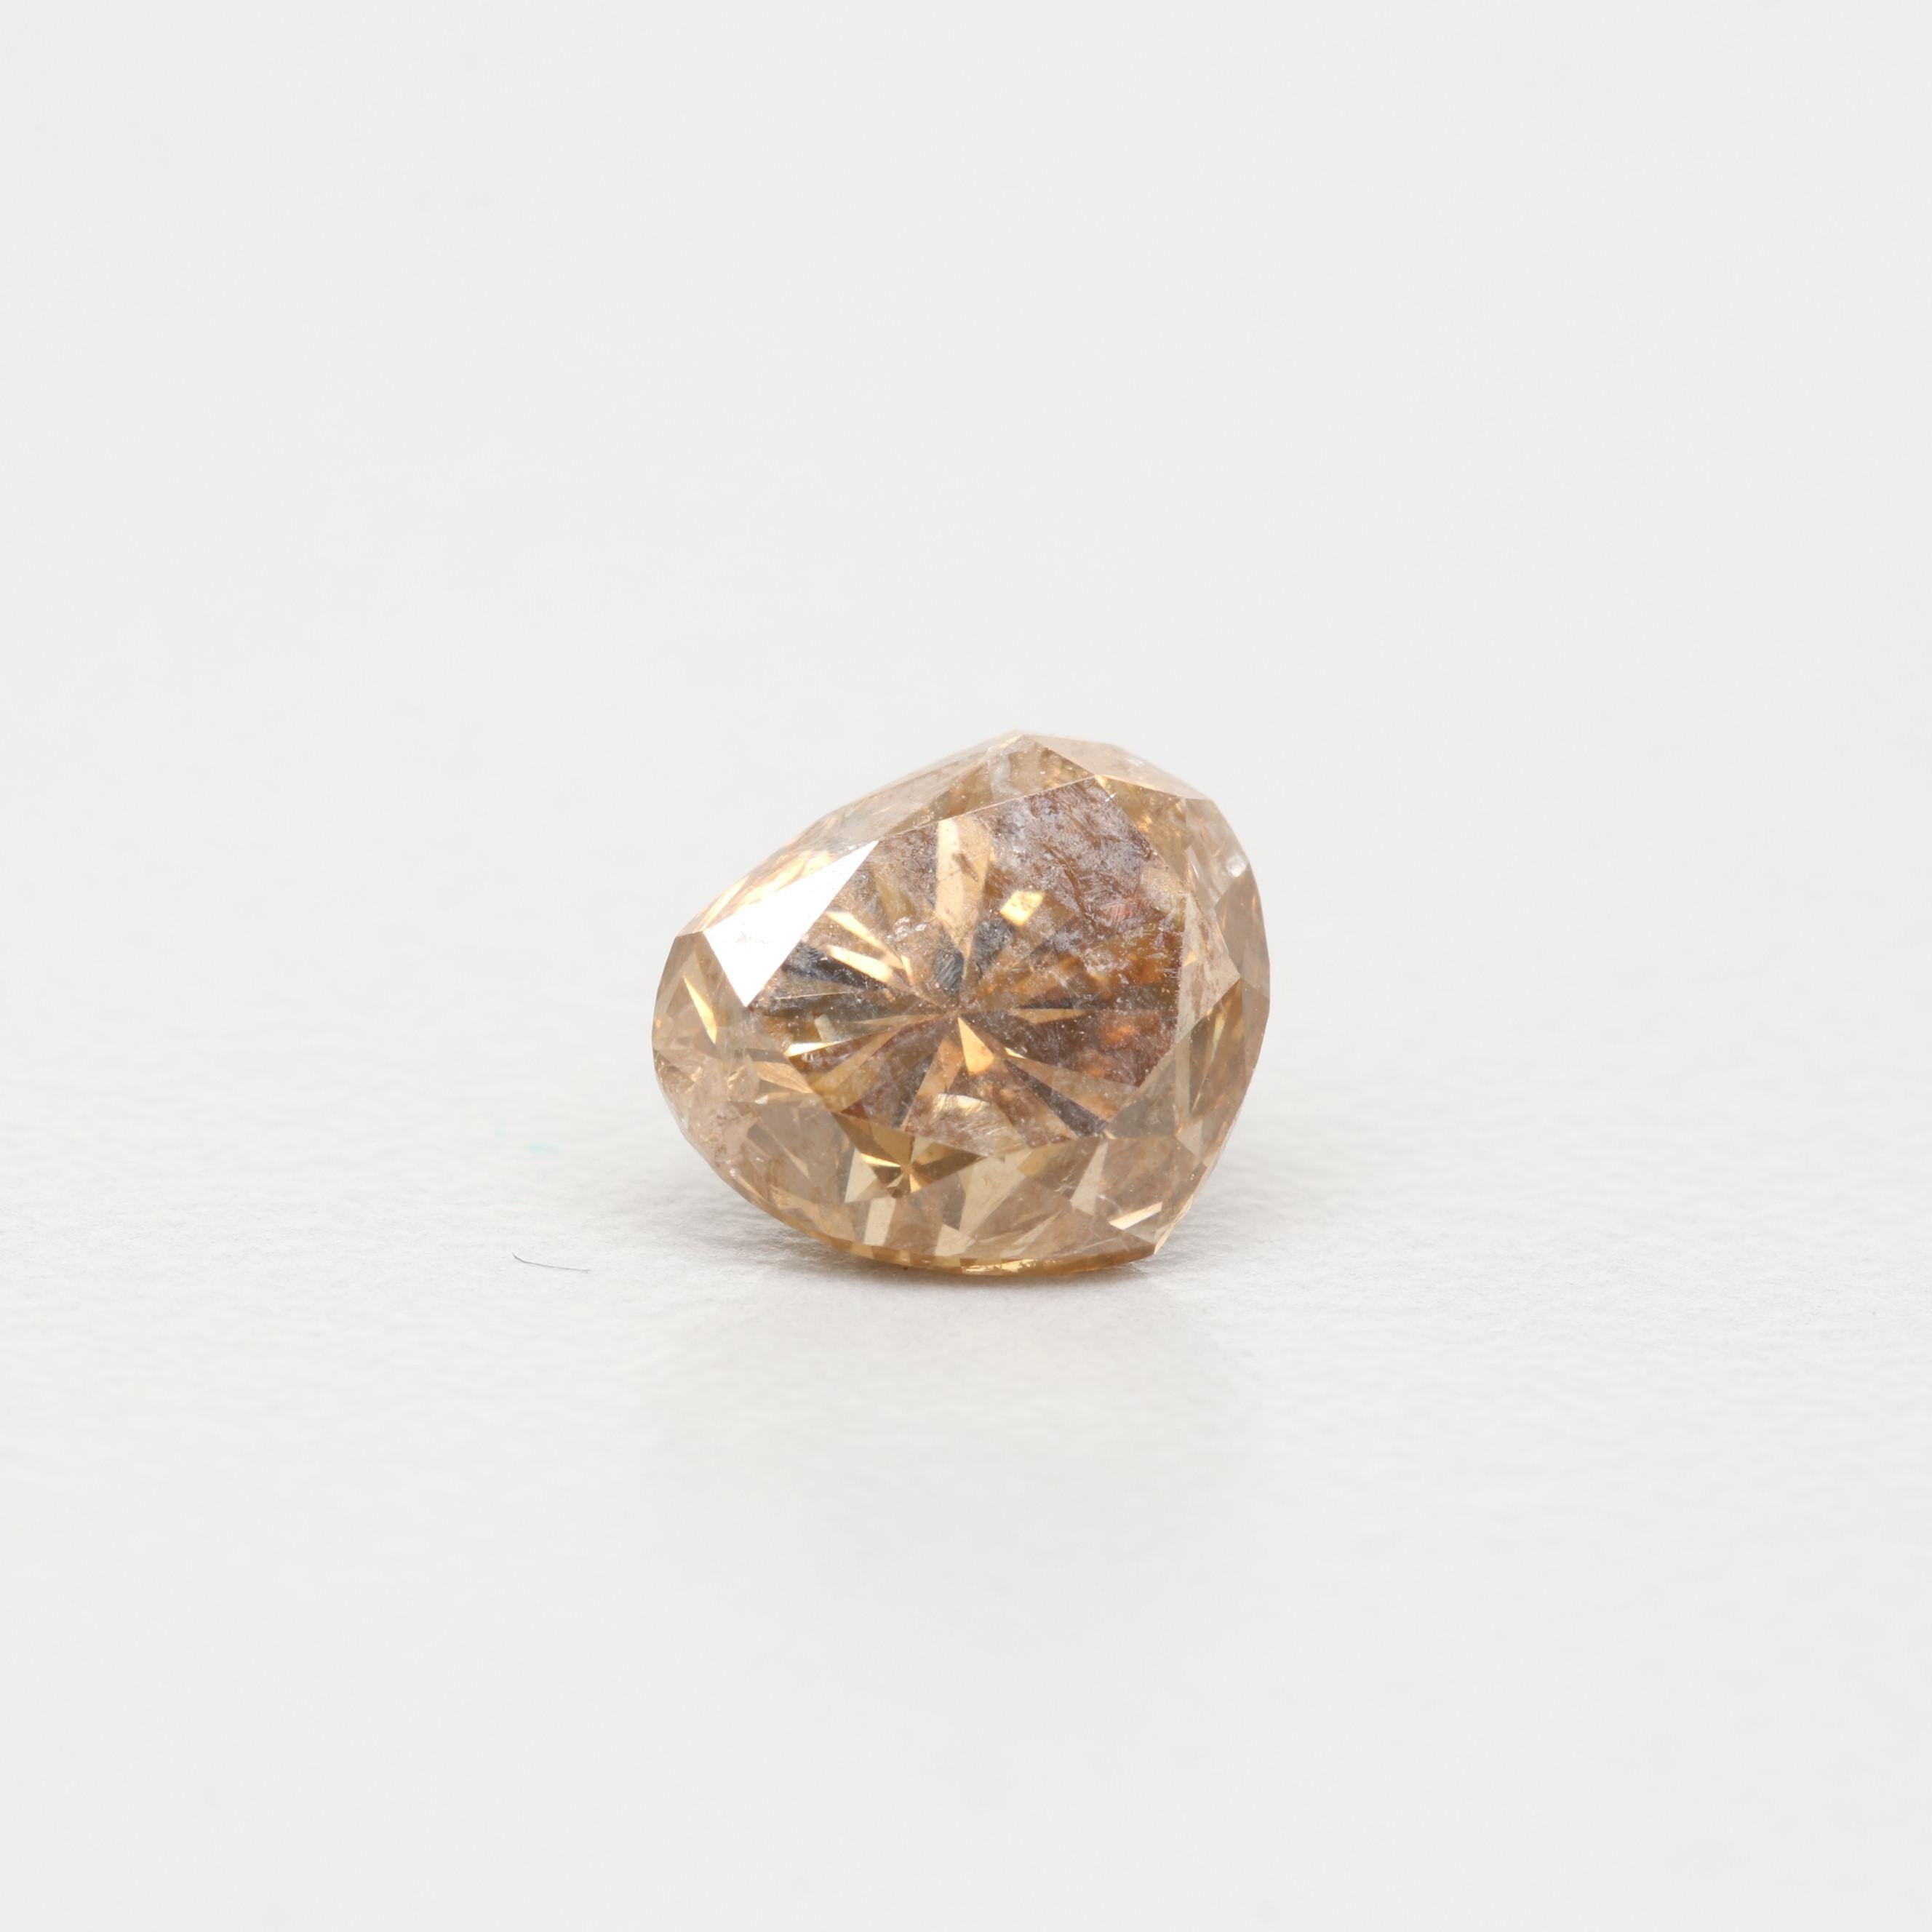 Loose 1.69 CT Diamond